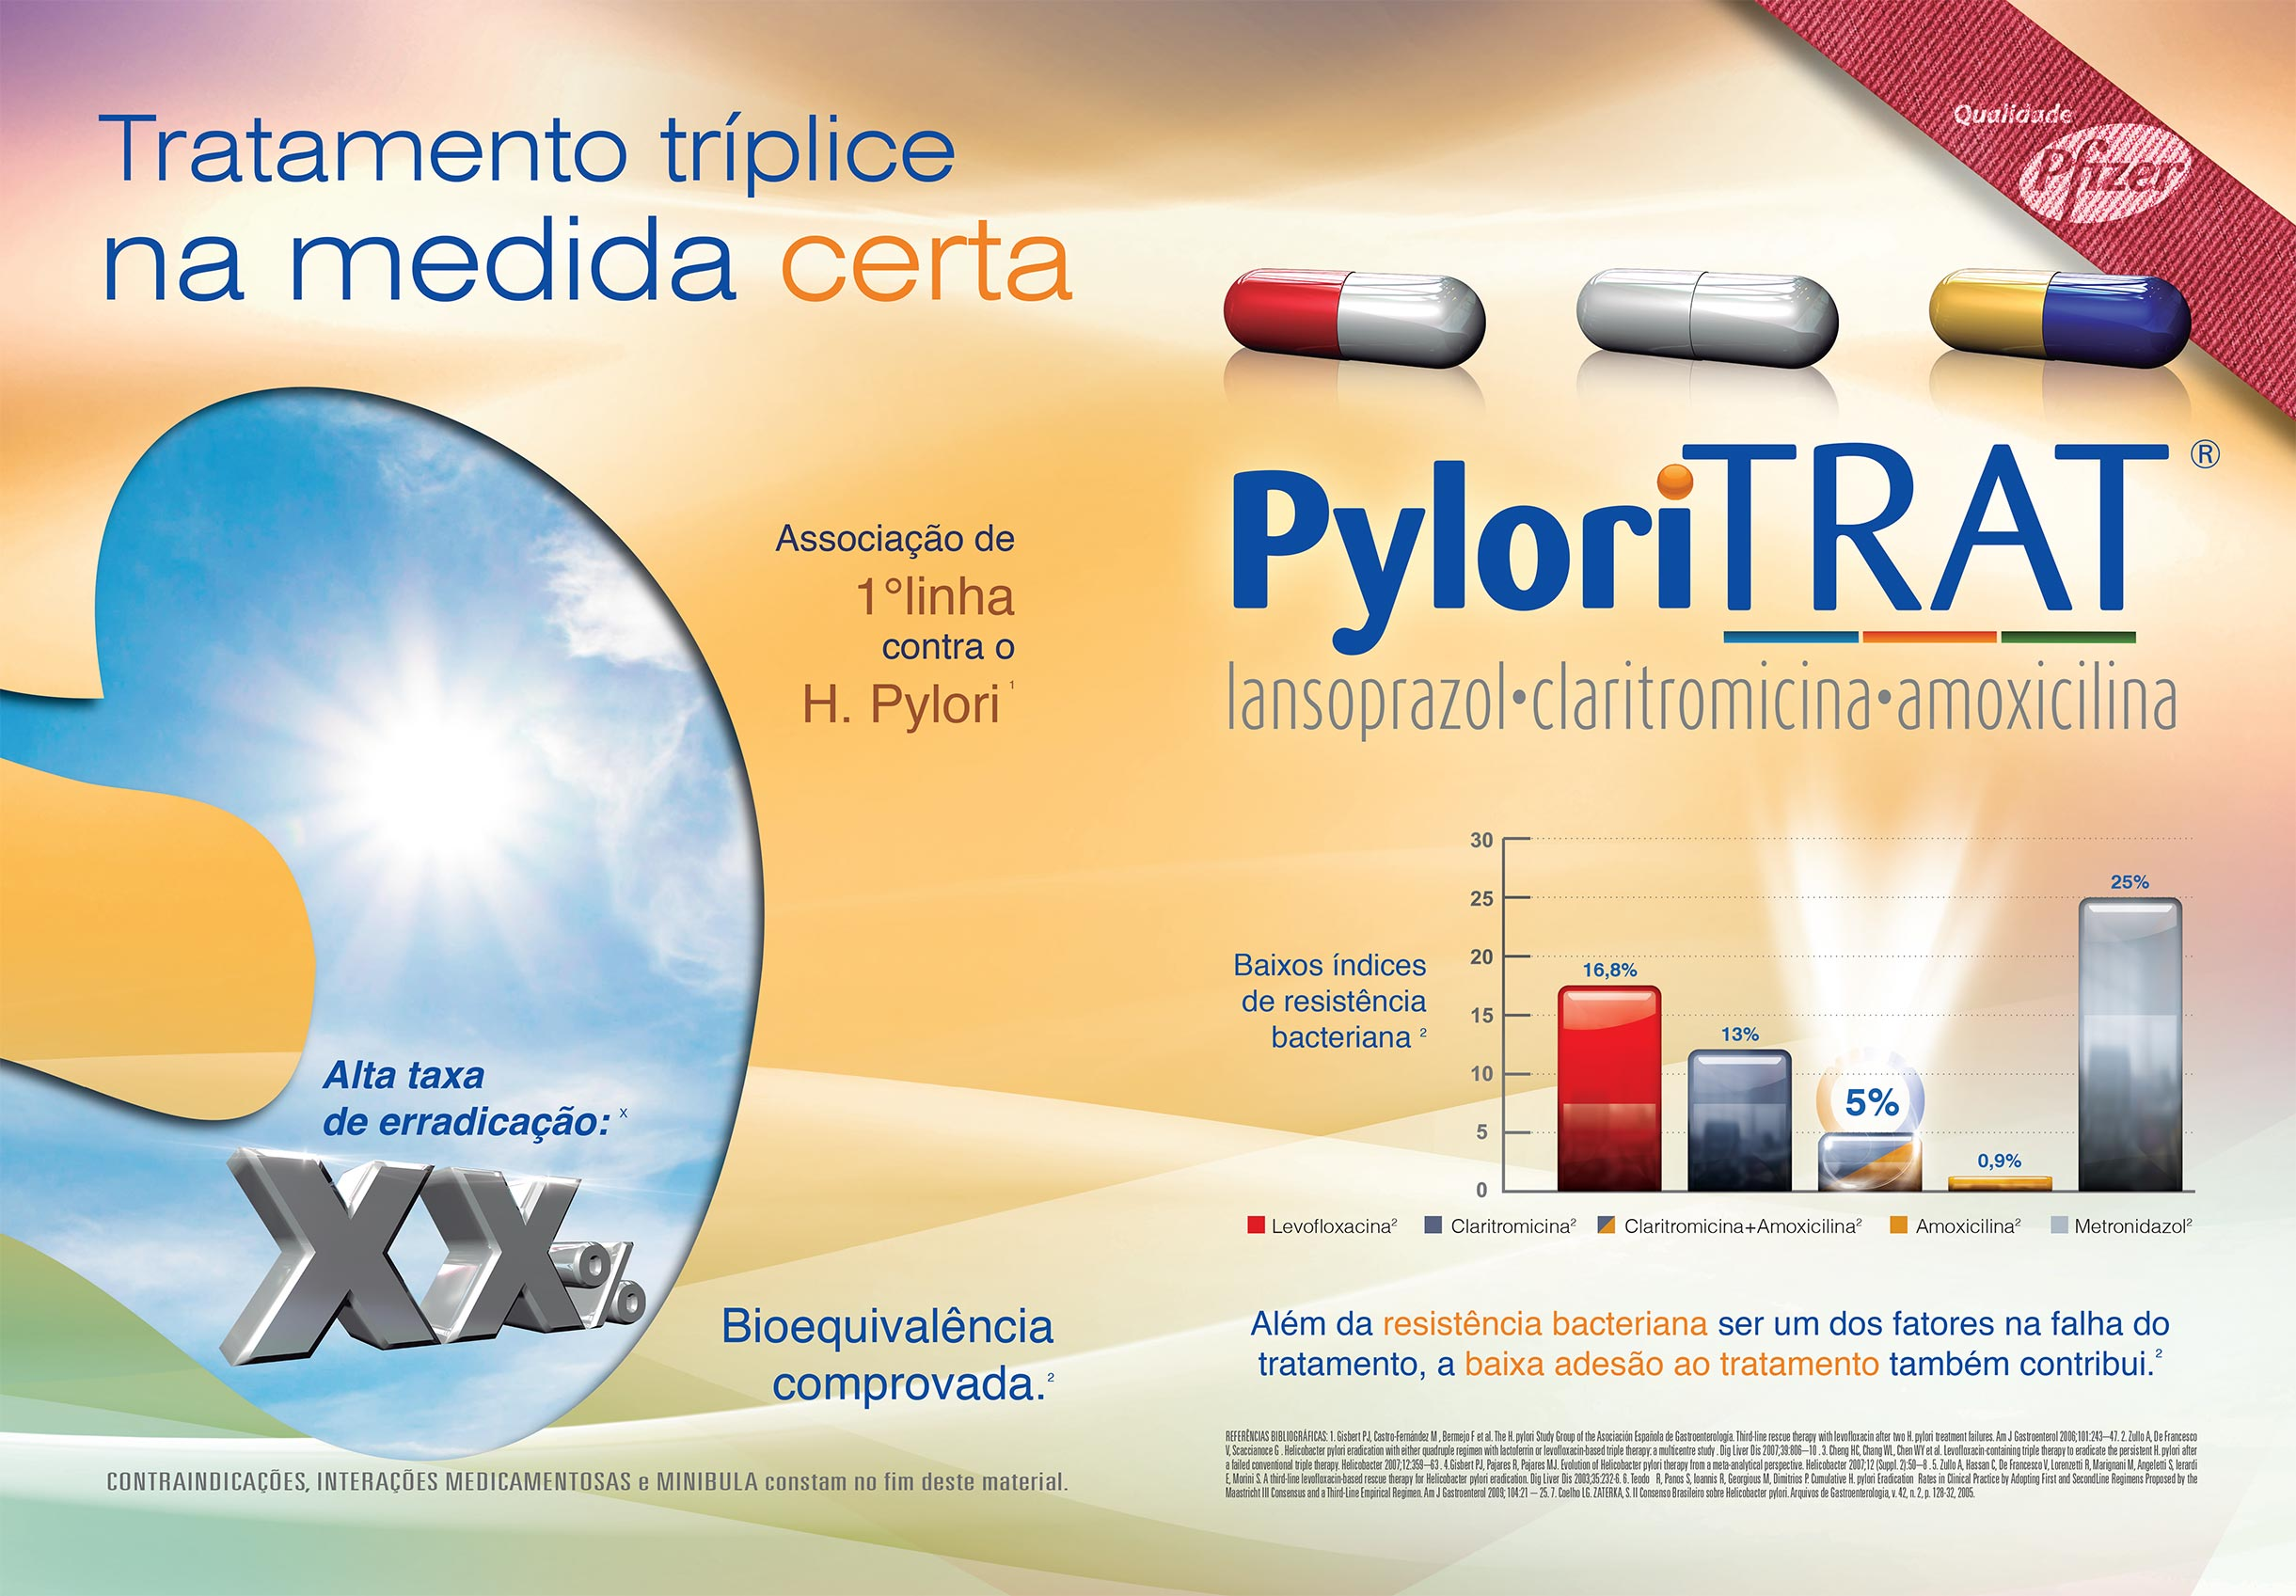 VA Pfizer PyloriTrat